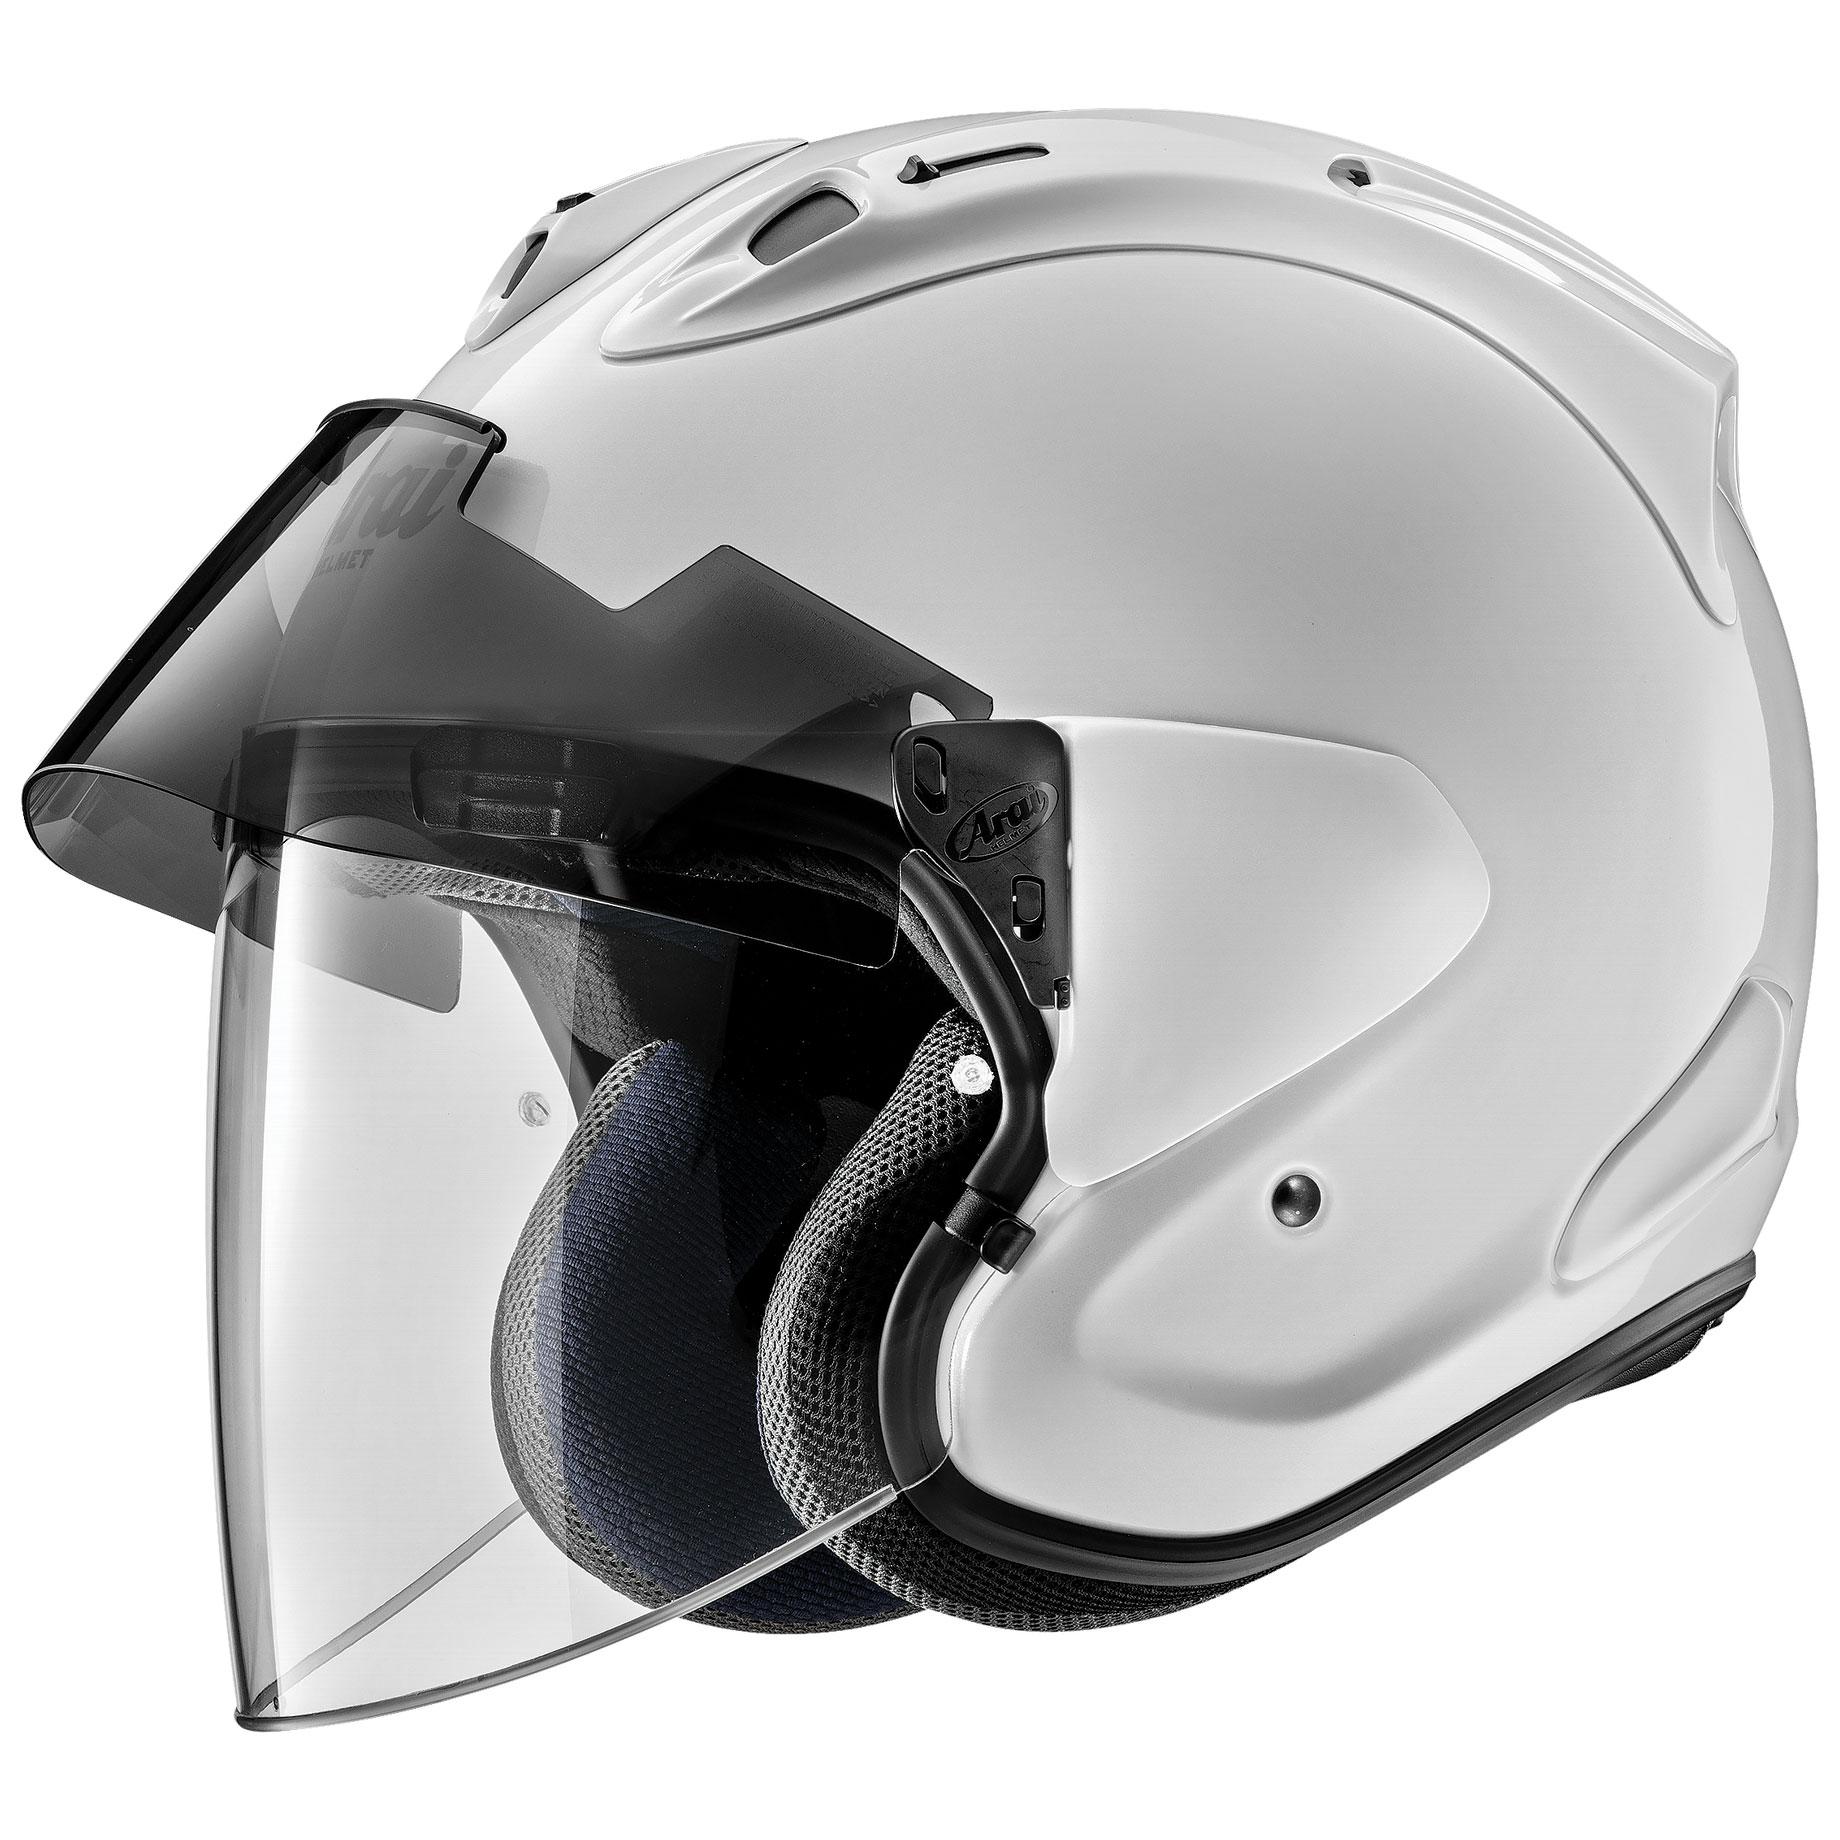 Arai Ram-X Diamond White Open Face Helmet - 685311163950